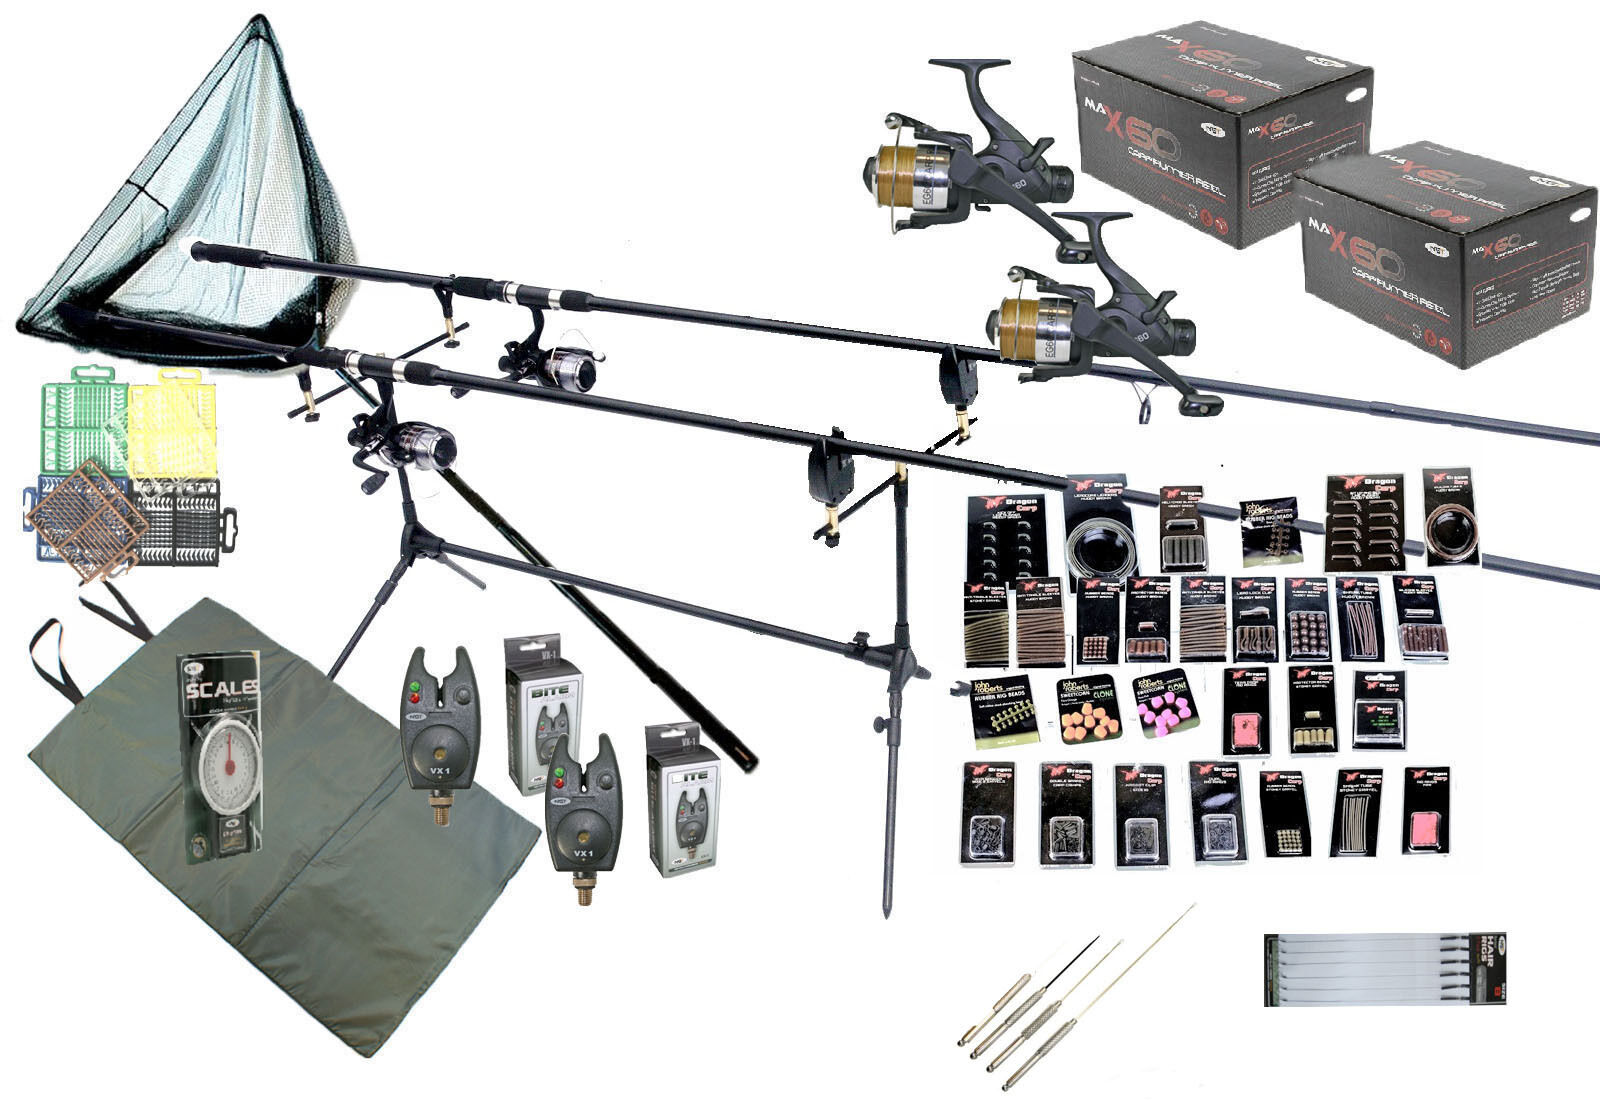 Set Rods Reels  Bait Tools Mat Tackle GIANT Accessory Pack Carp Fishing Kit